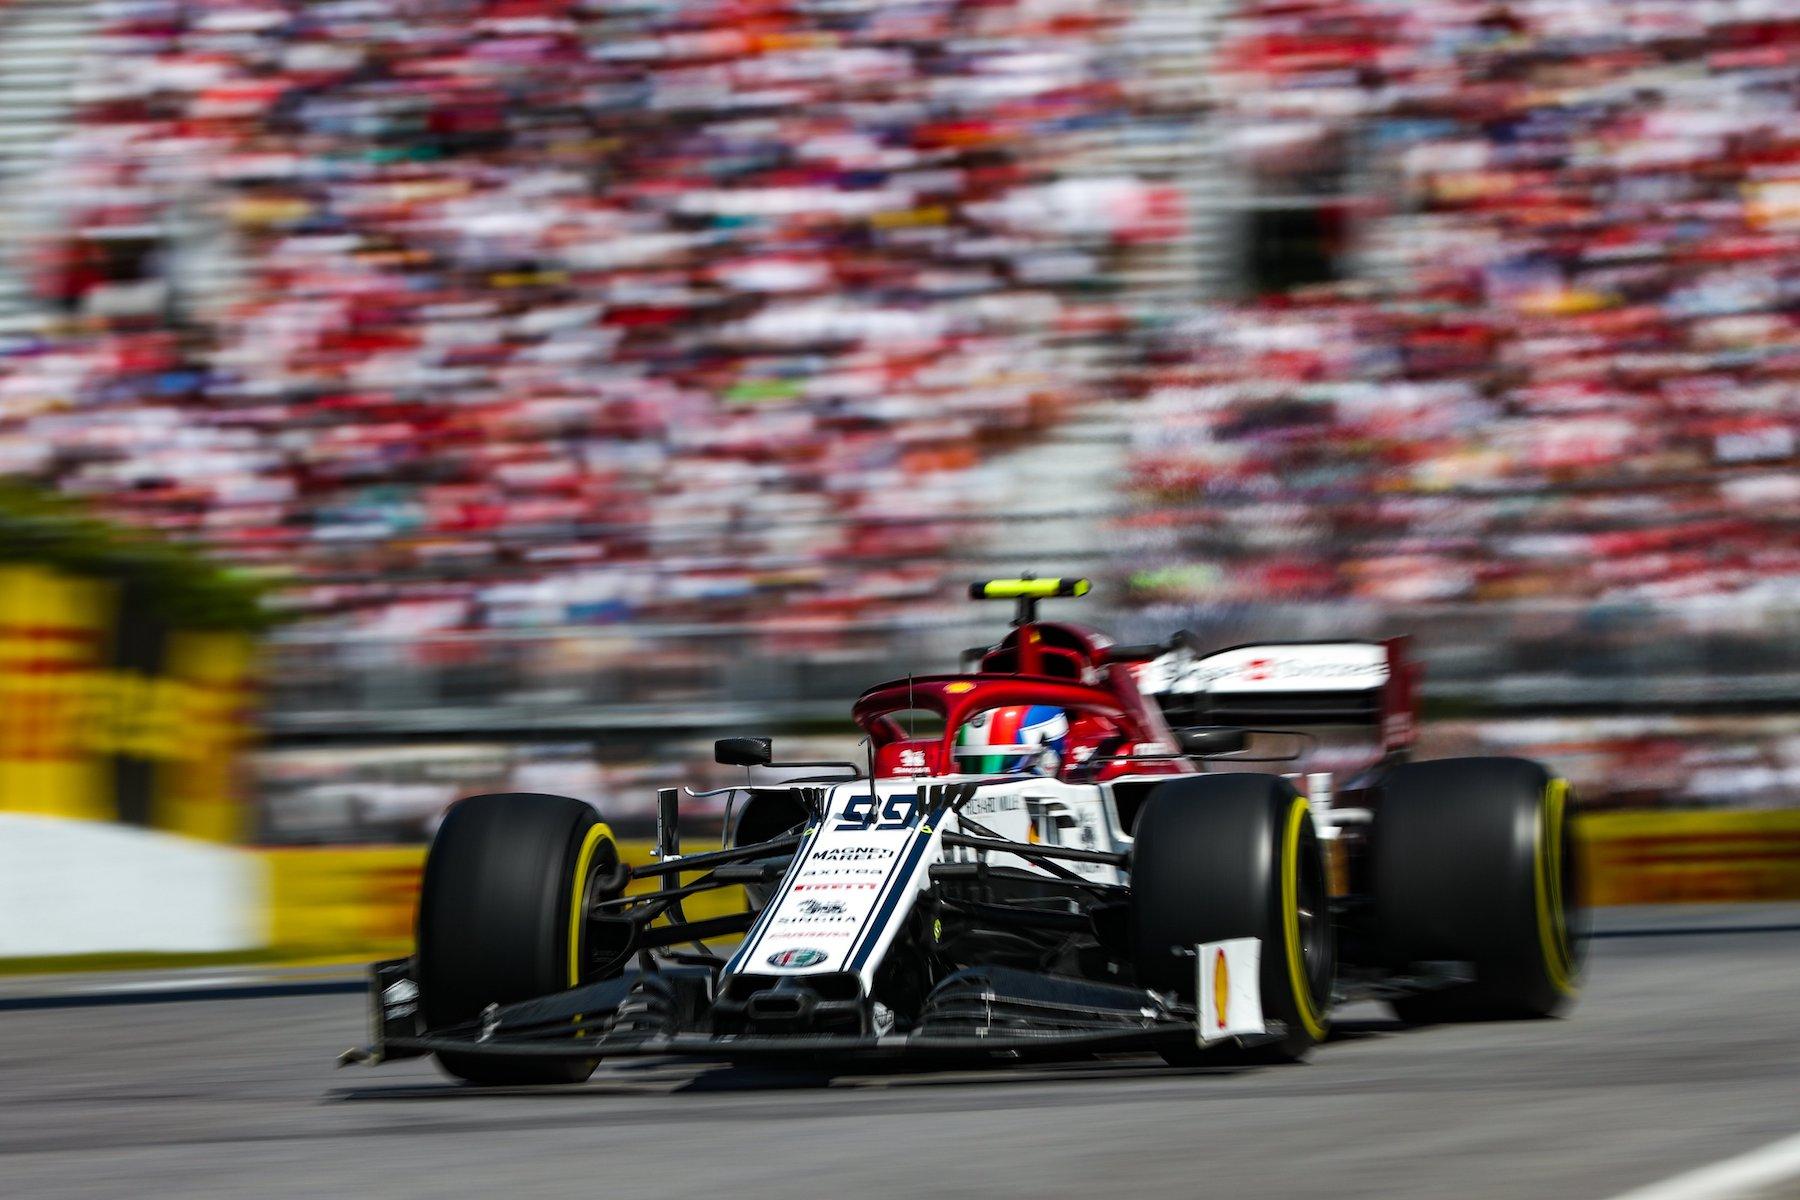 4 2019 Canadian GP 39.jpg